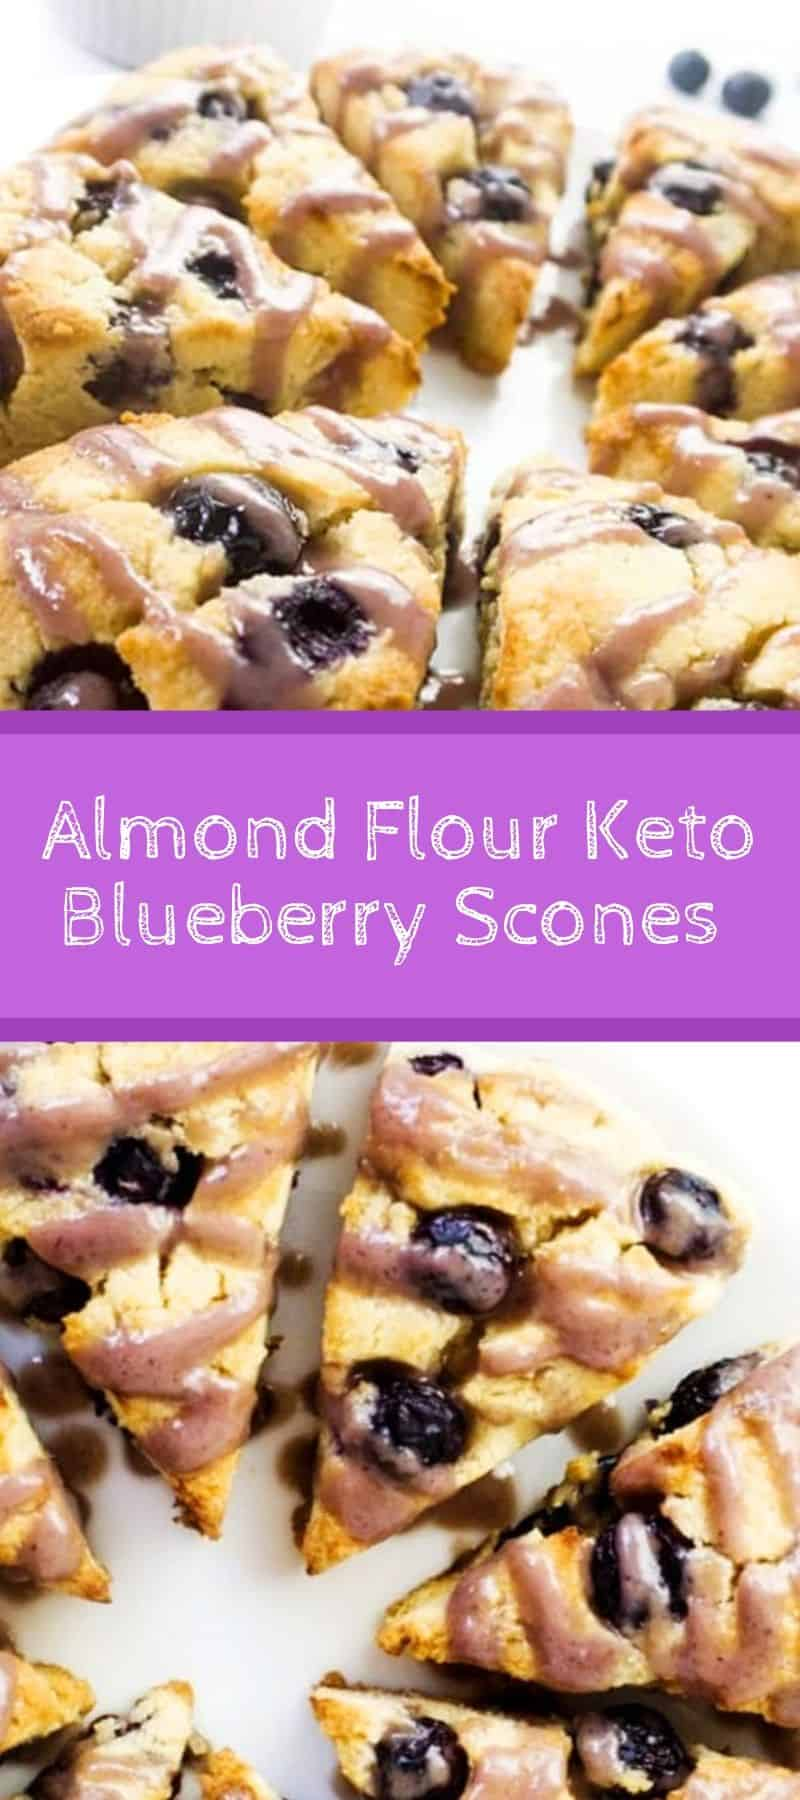 Almond Flour Keto Blueberry Scones Recipe 3